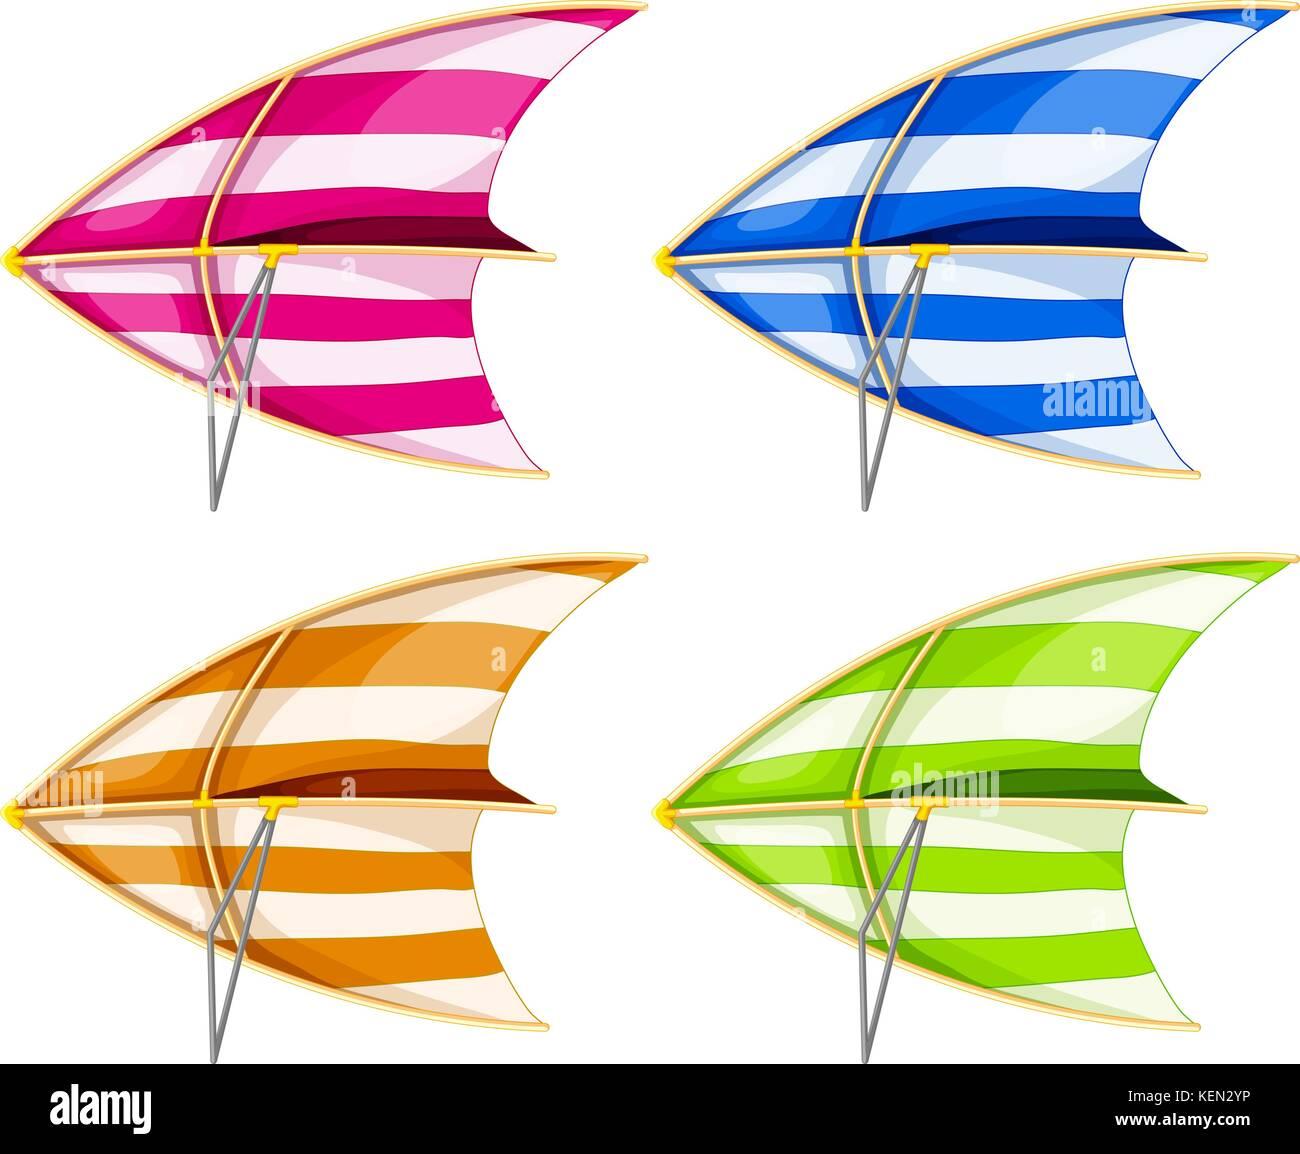 Set of 4 colorful hang gliders - Stock Image